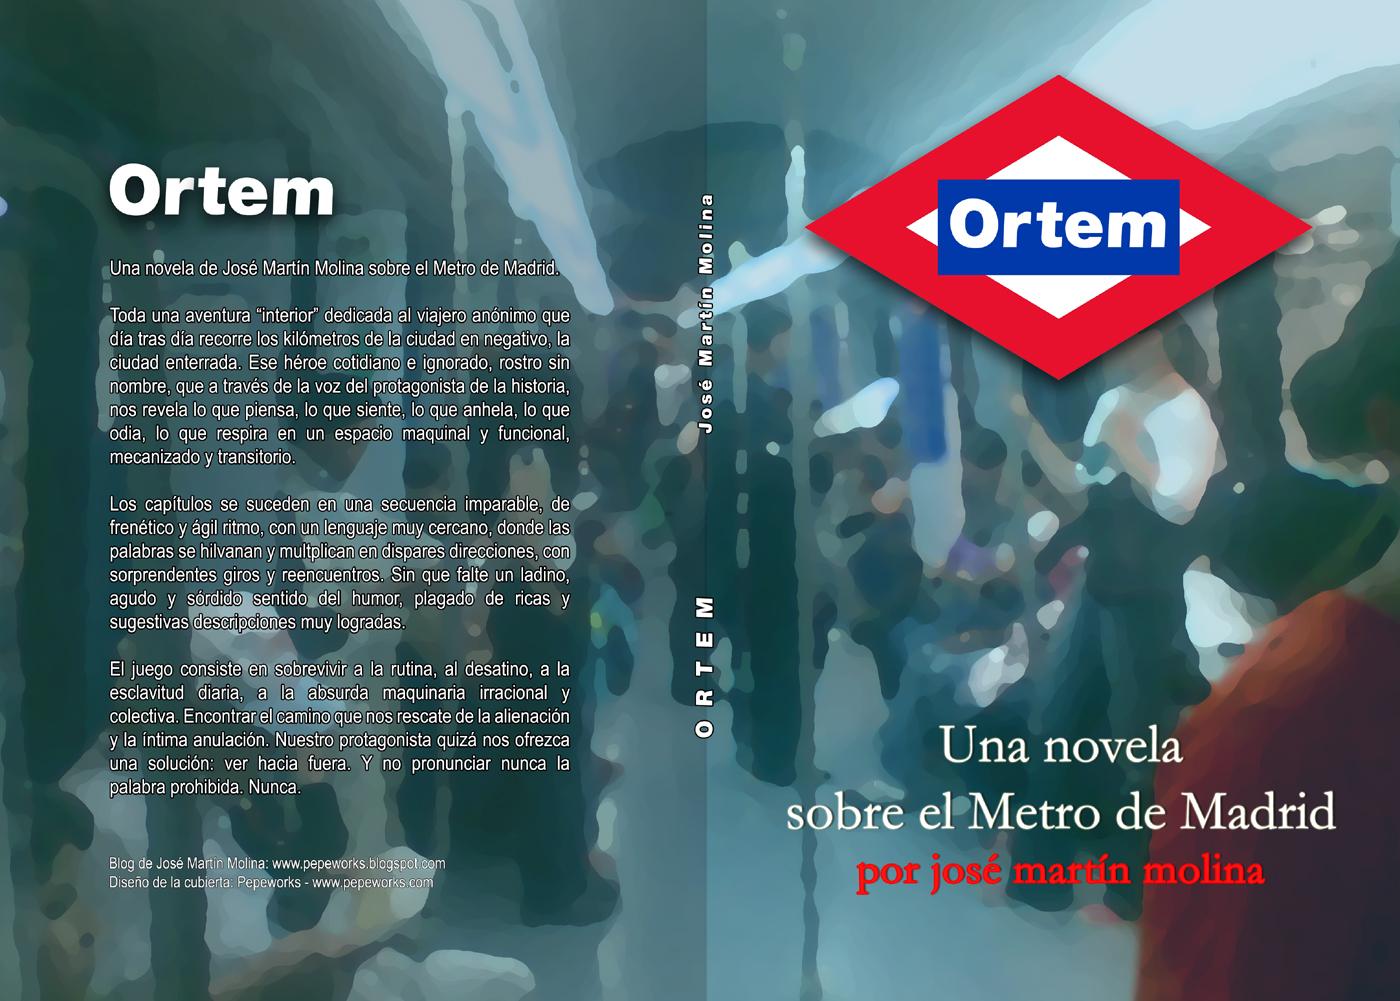 cubierta-ortem-novela-metro